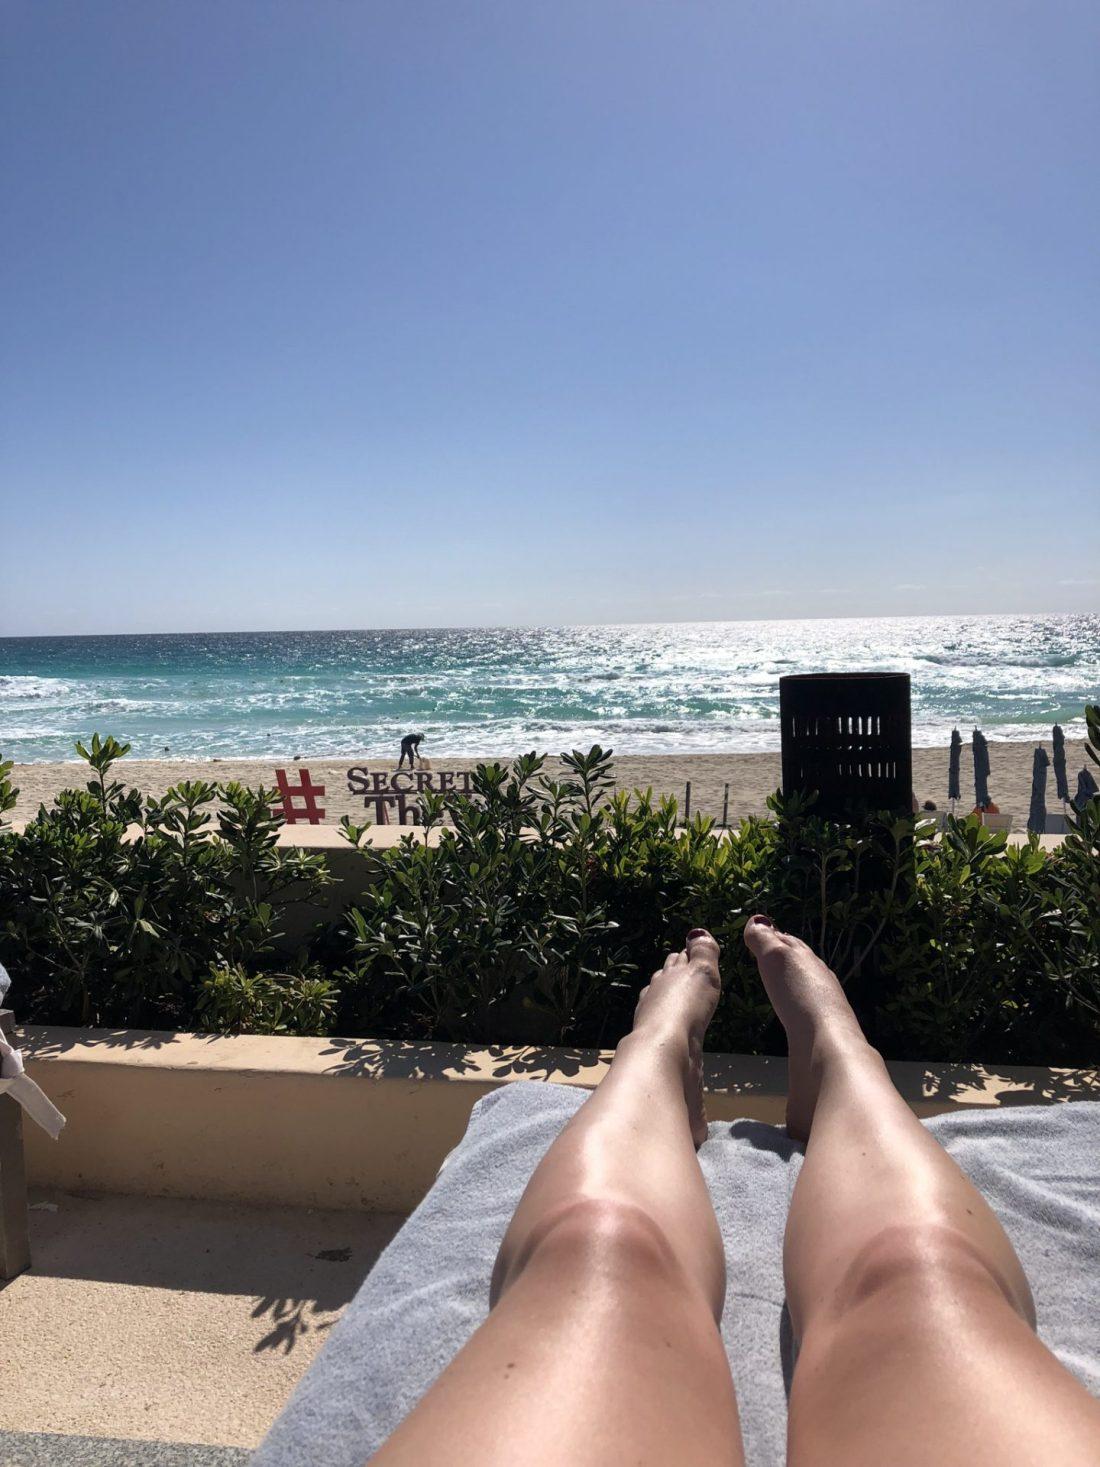 Sunbathing at Secrets The Vine, Cancún